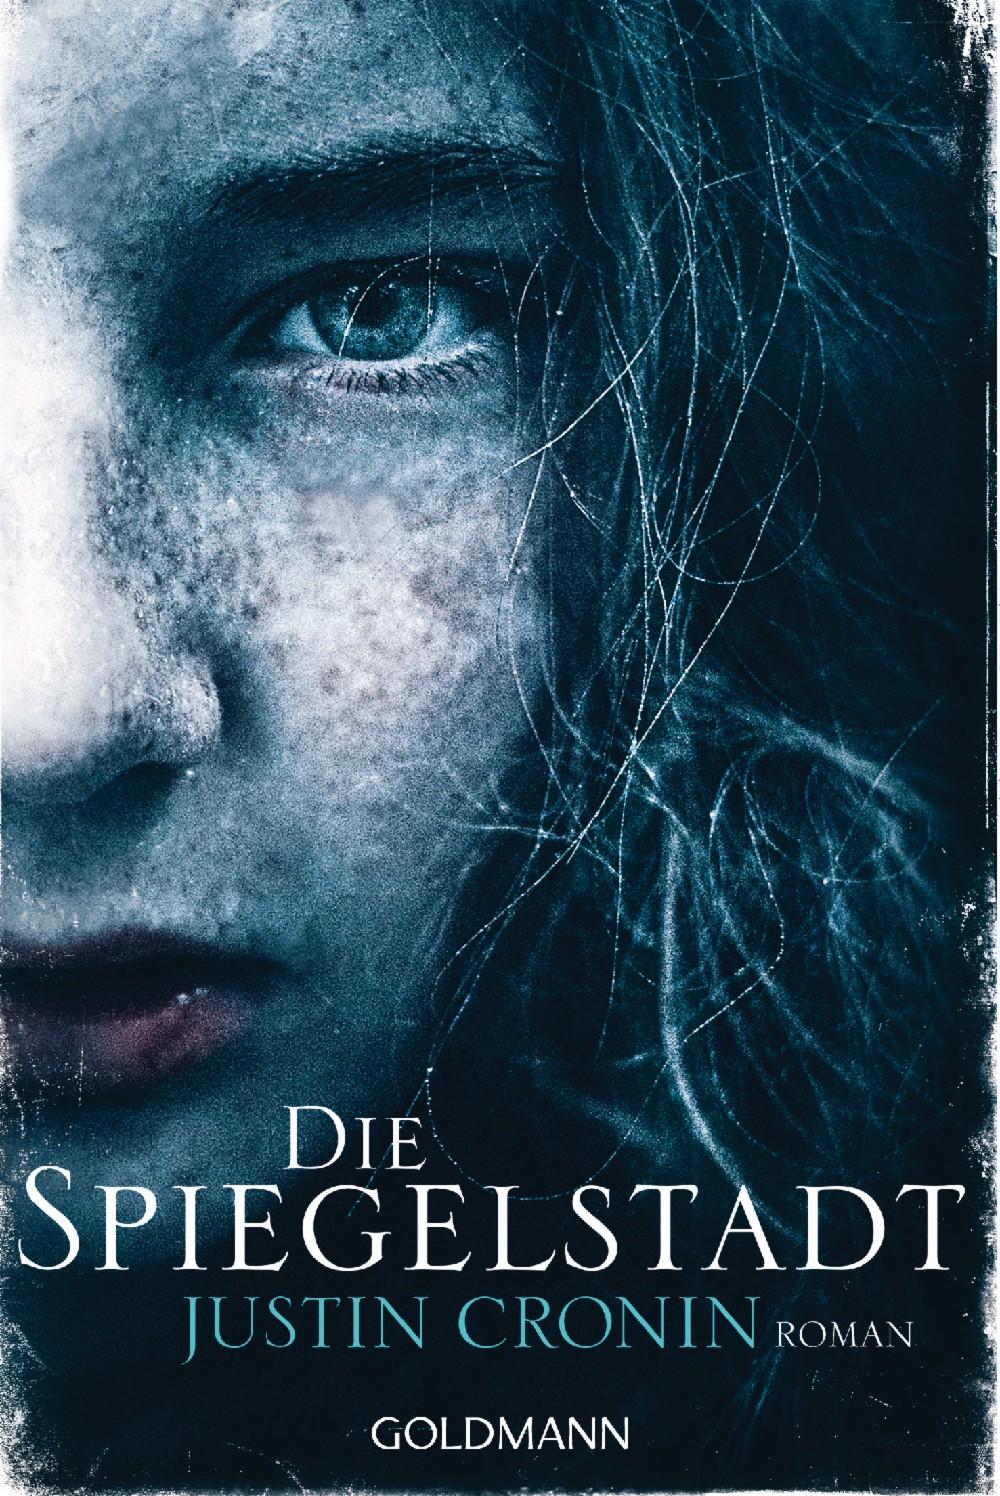 https://www.randomhouse.de/Buch/Die-Spiegelstadt/Justin-Cronin/Goldmann/e271778.rhd